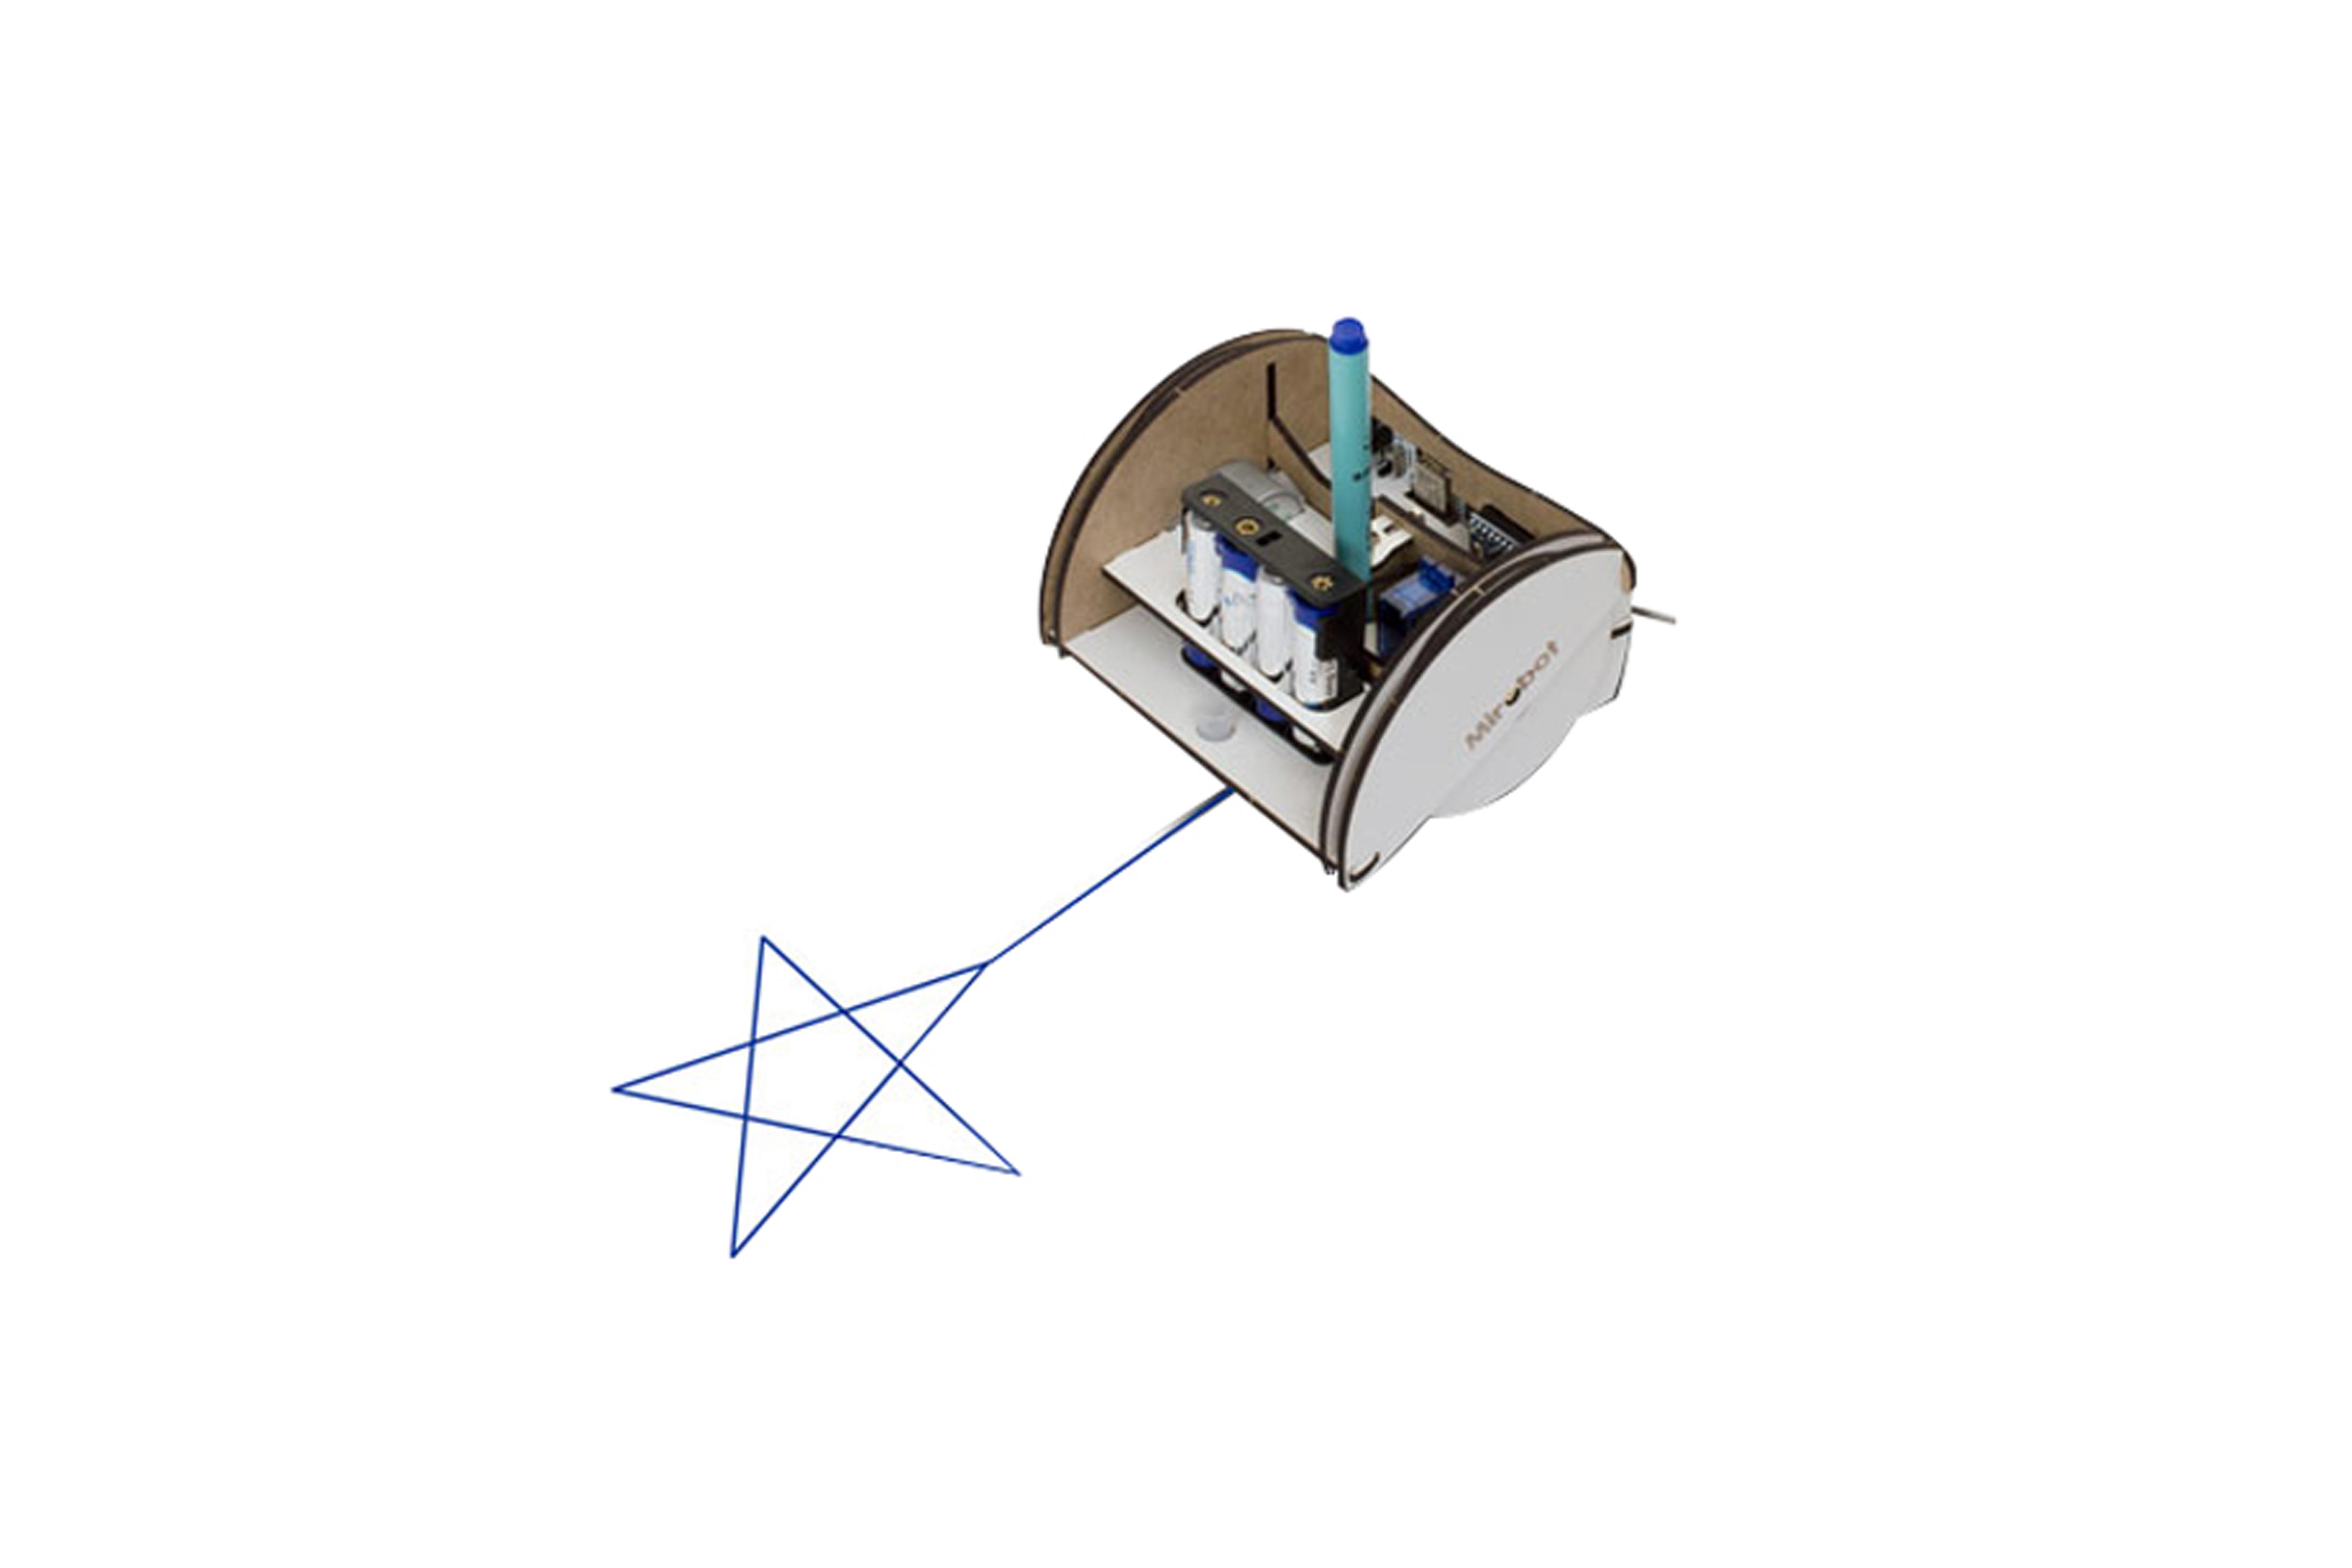 MIROBOT ドローイングロボットキット - フルキット